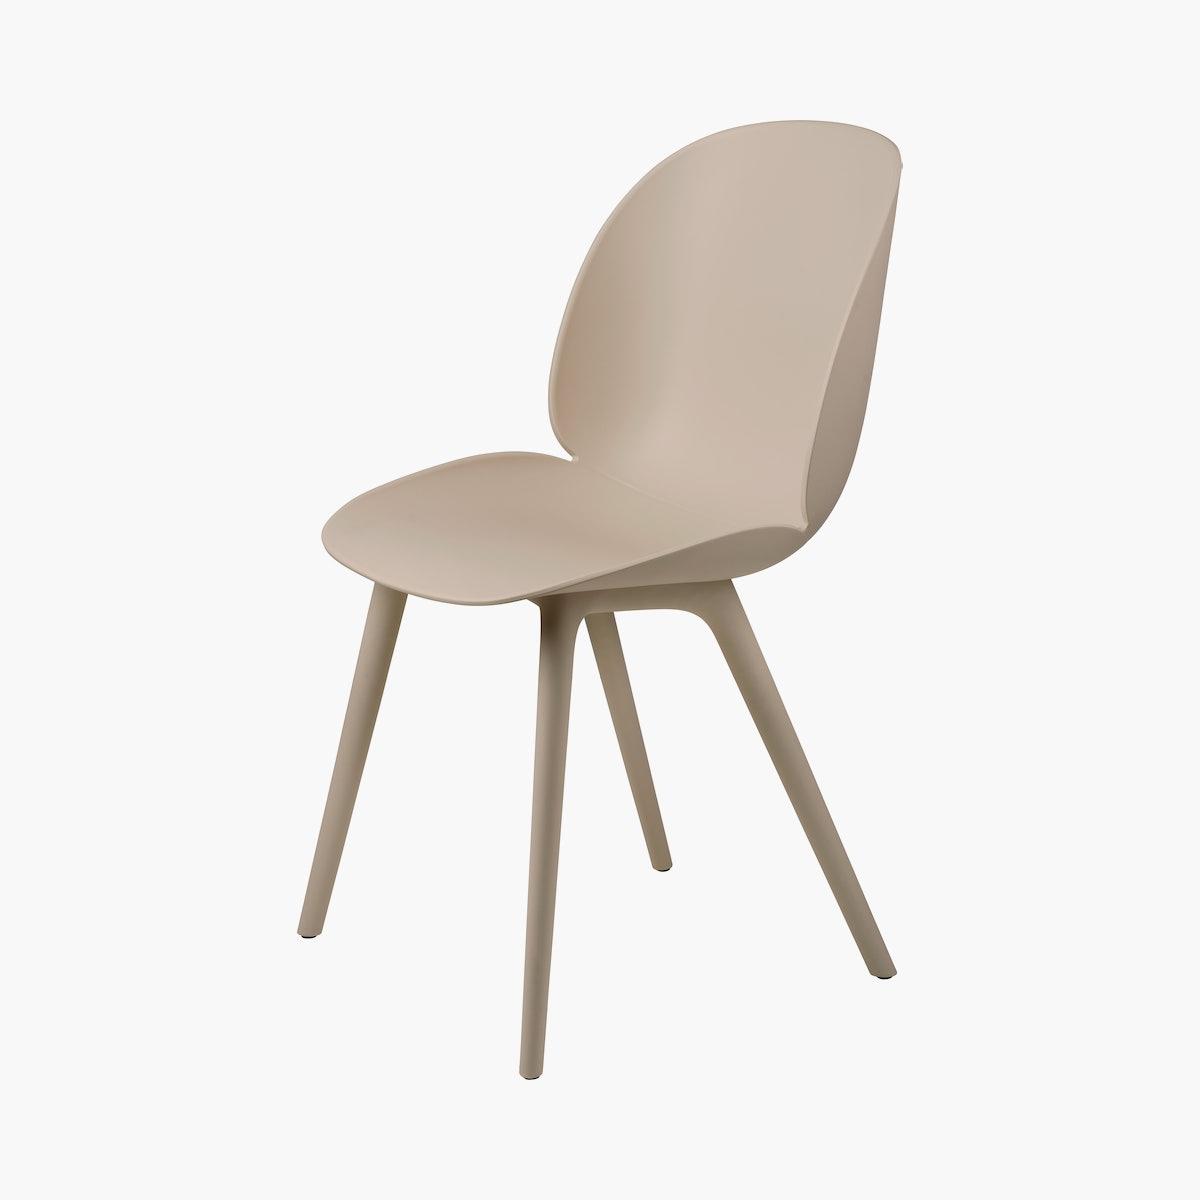 Beetle Outdoor Chair